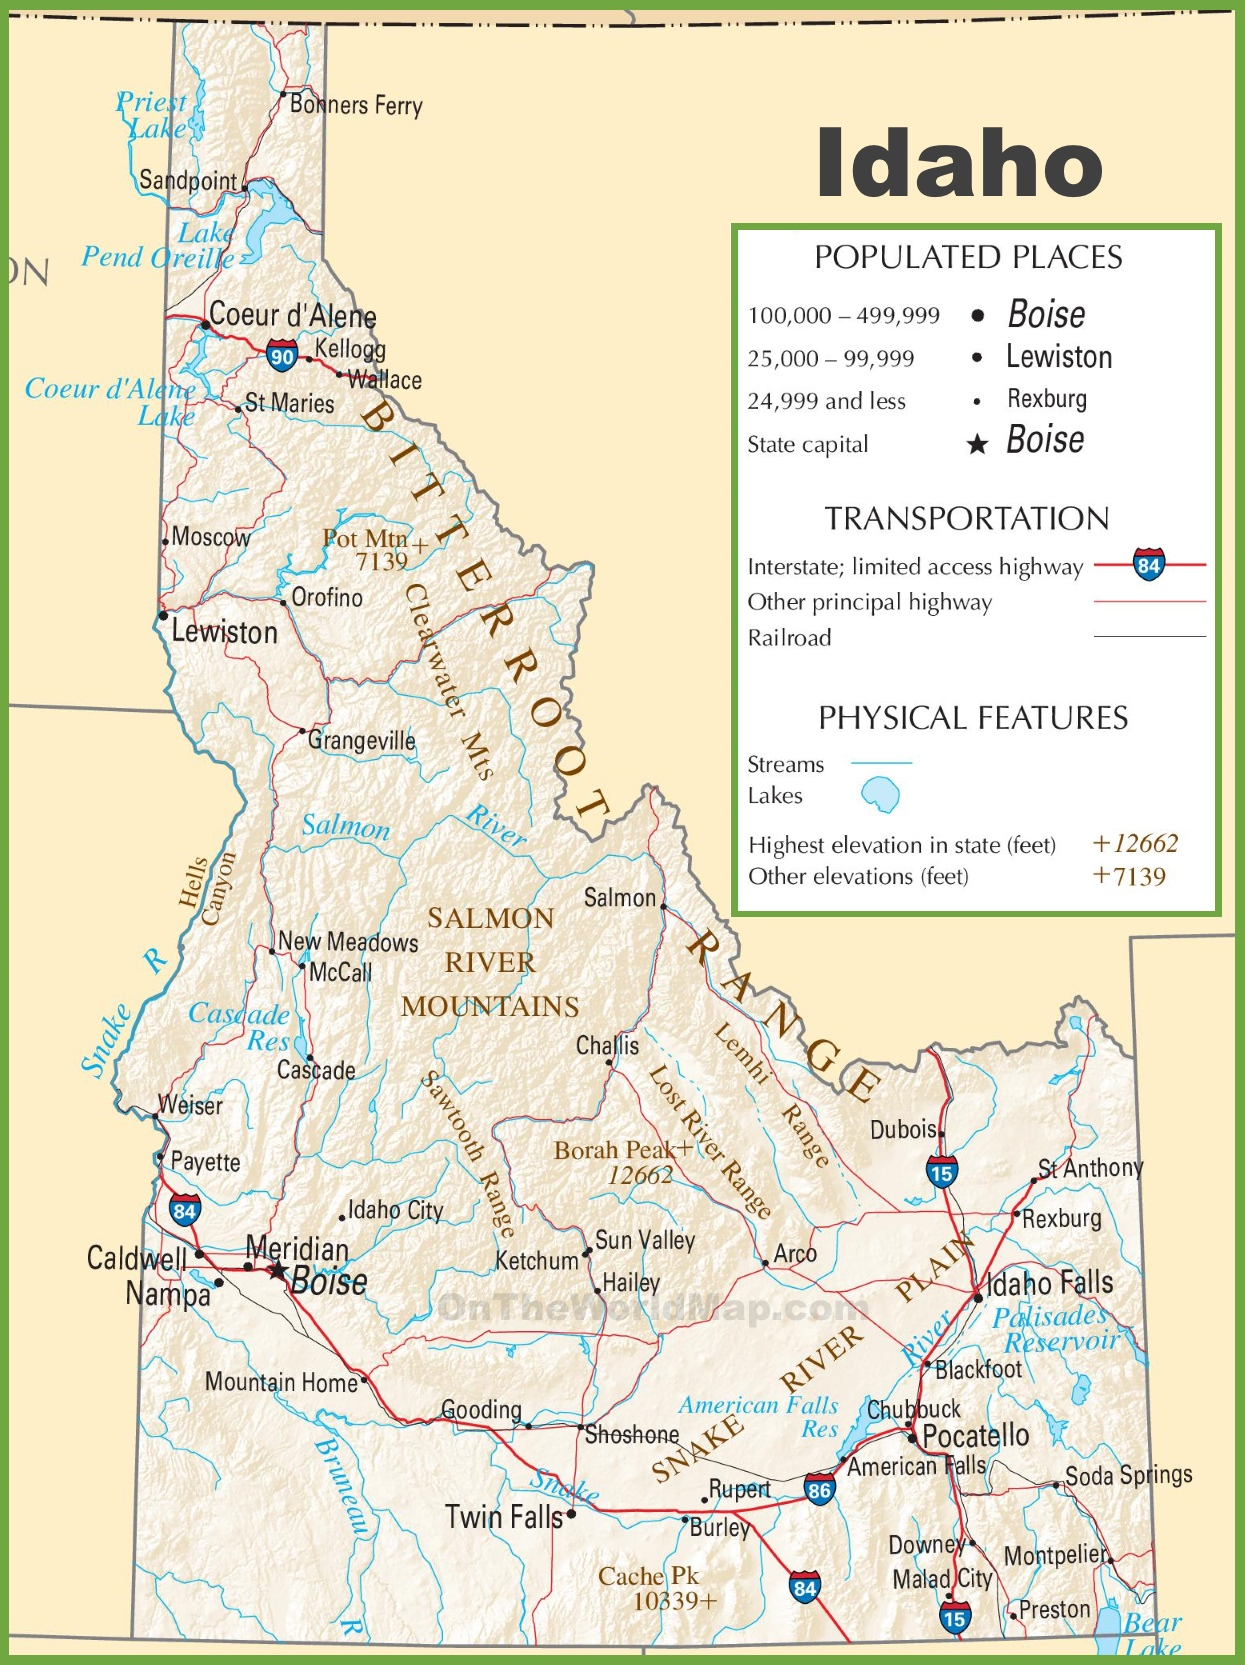 Idaho State Map Idaho highway map Idaho State Map